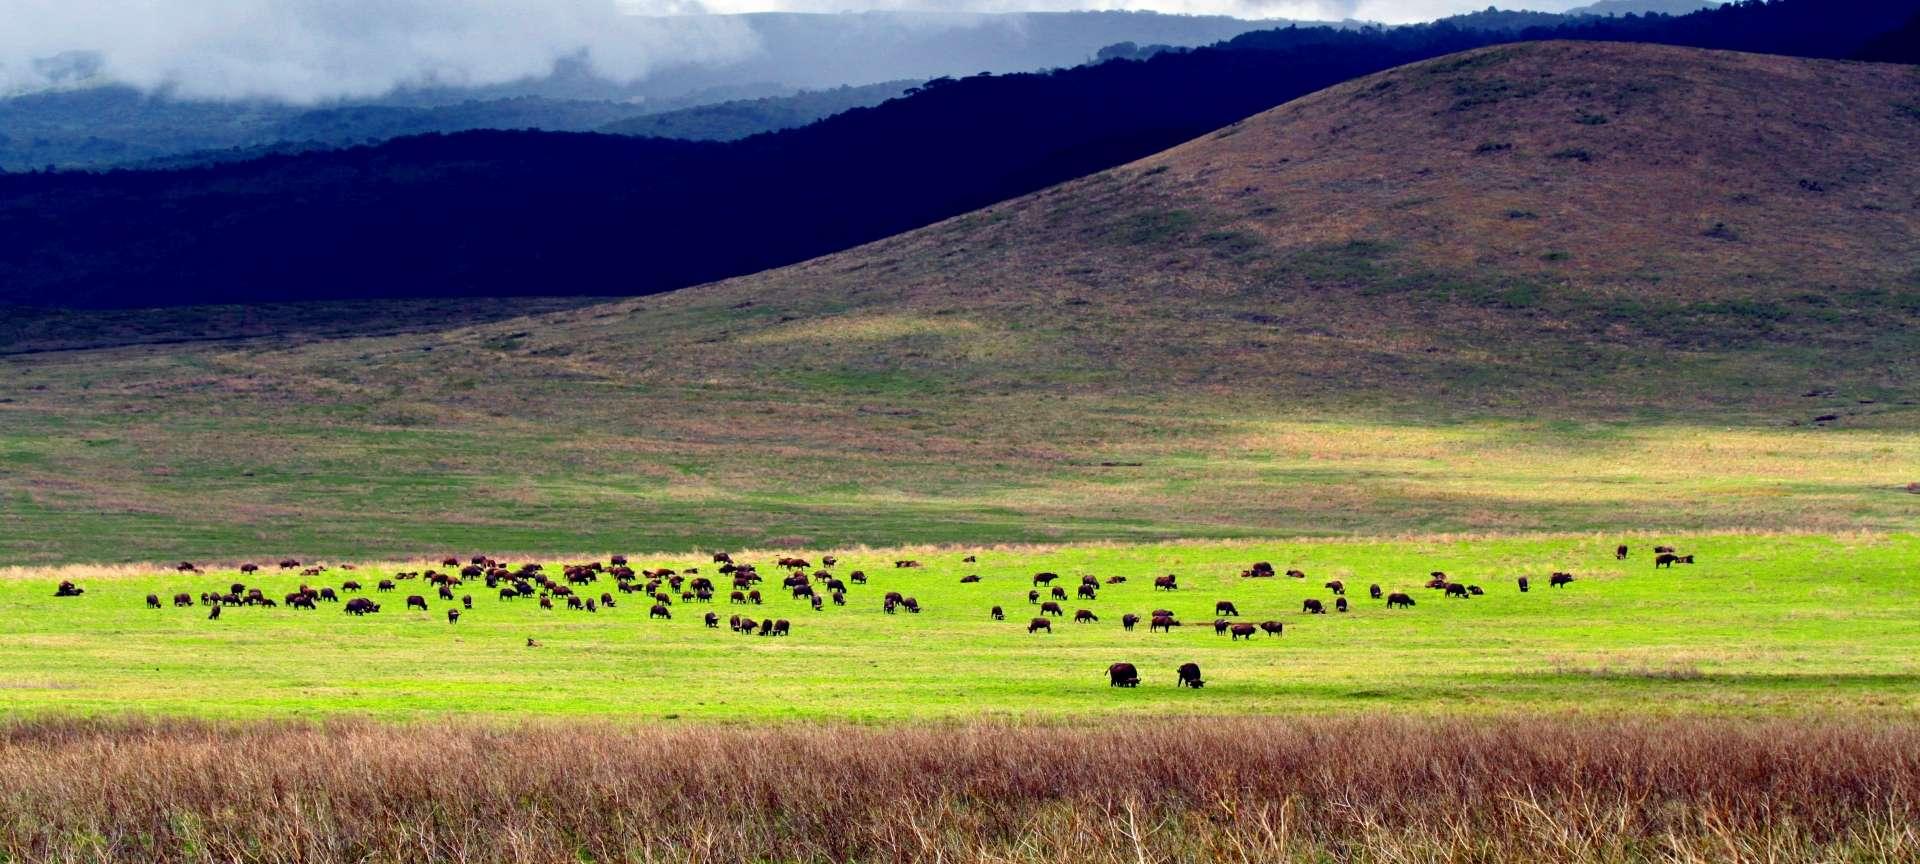 Tanzania Western Circuit - Africa Wildlife Safaris